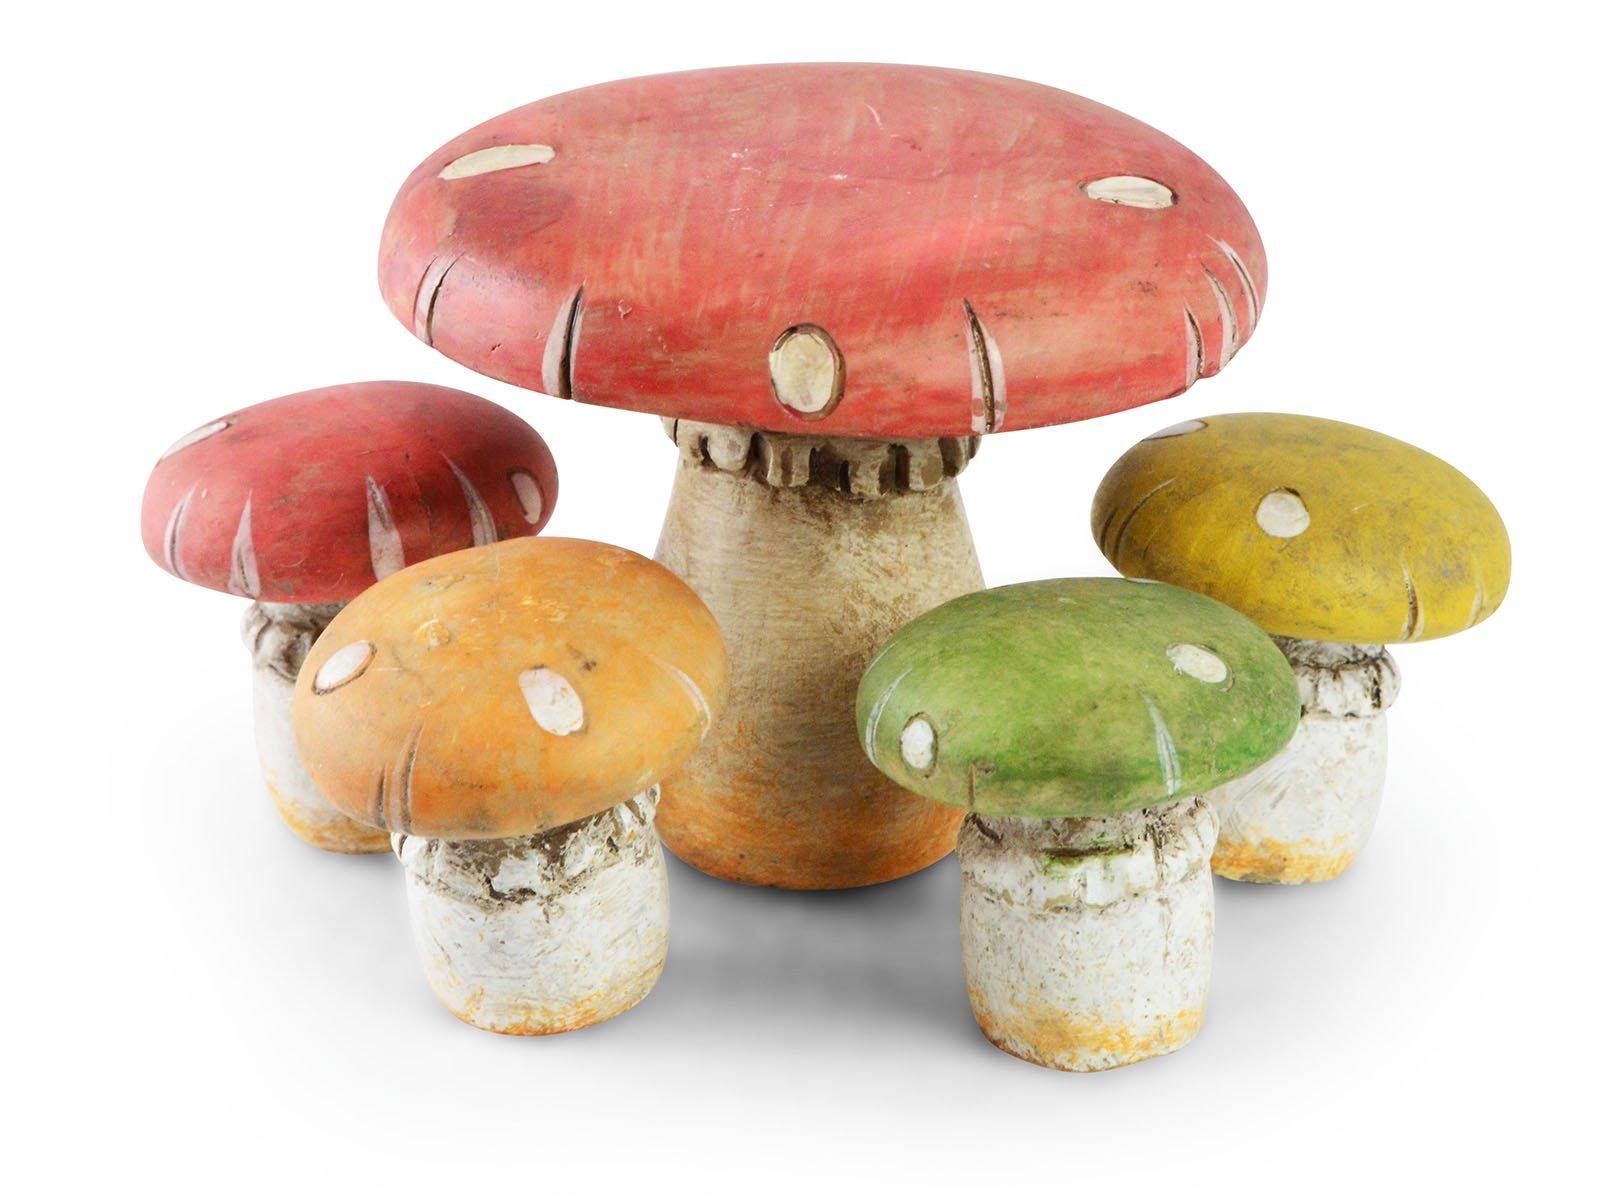 Sugar House Miniature Fairy Garden Accessories – Garden Décor Accessories Home for Fairies (Mushroom Table w/Stools (Set of 5))